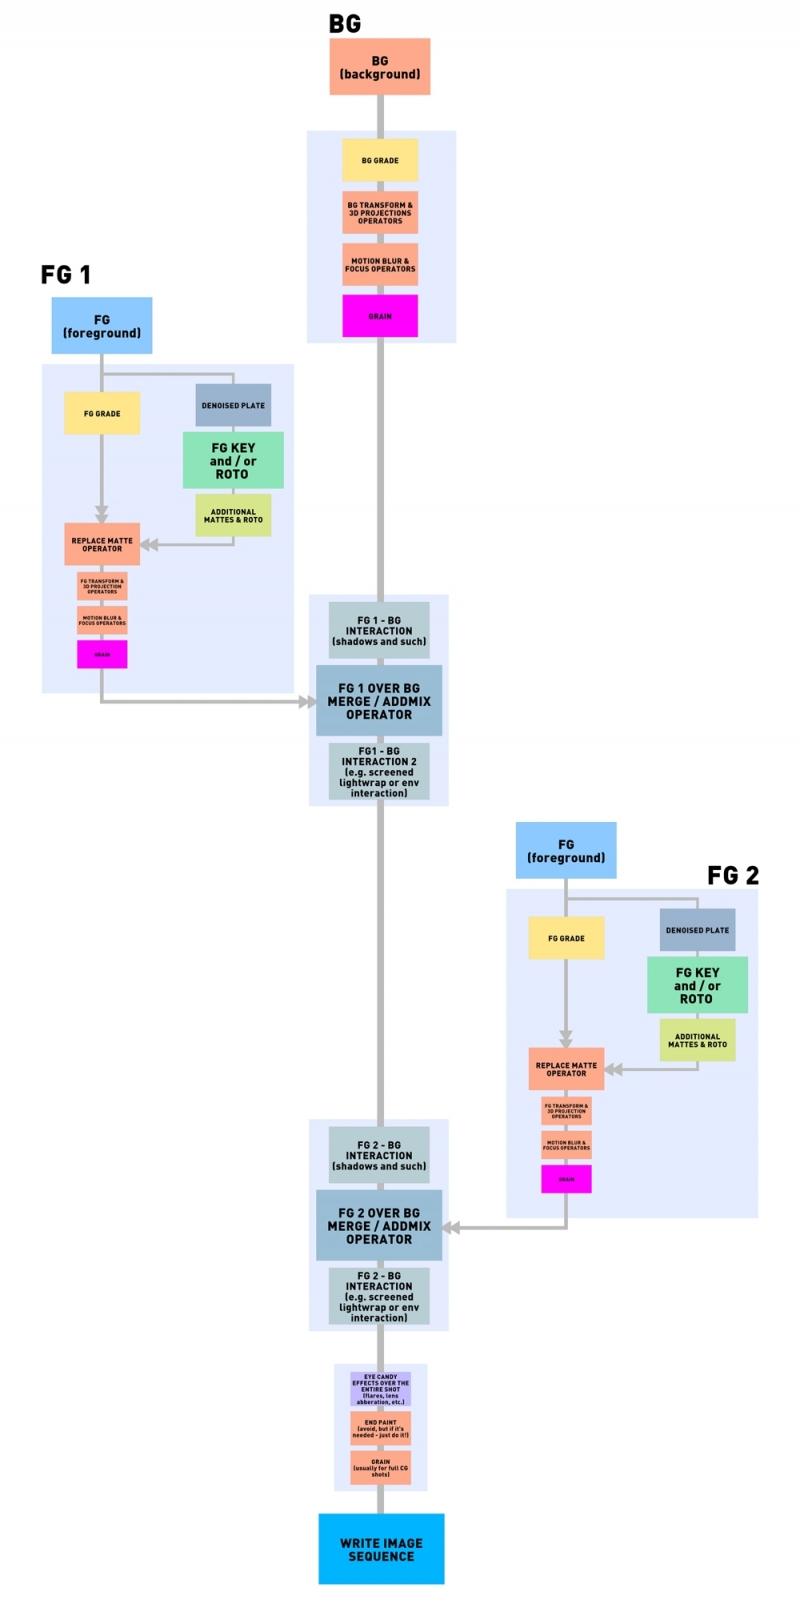 Nuke_ScriptBestPractices.thumb.jpg.da48a364074f7f1c3be61d893c4752de.jpg